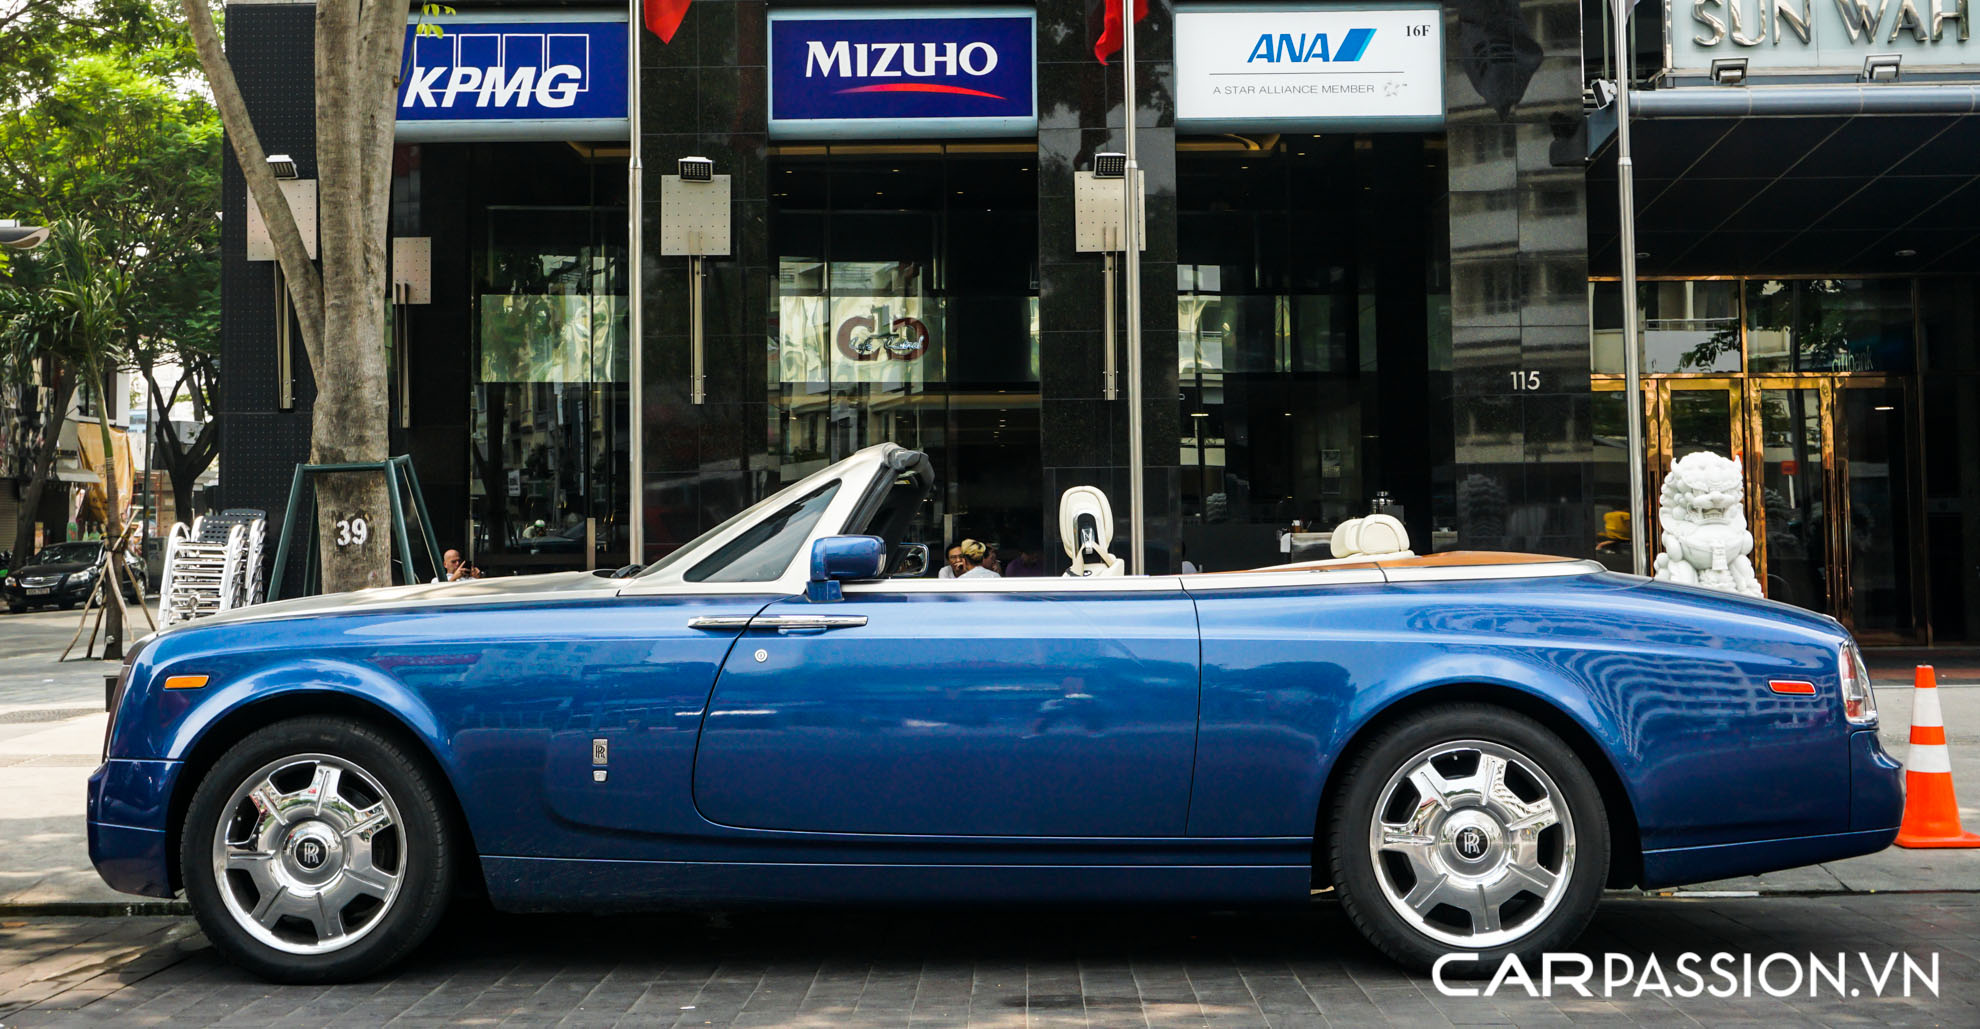 CP-Rolls-Royce Phantom Drophead Coupe xanh (12).jpg